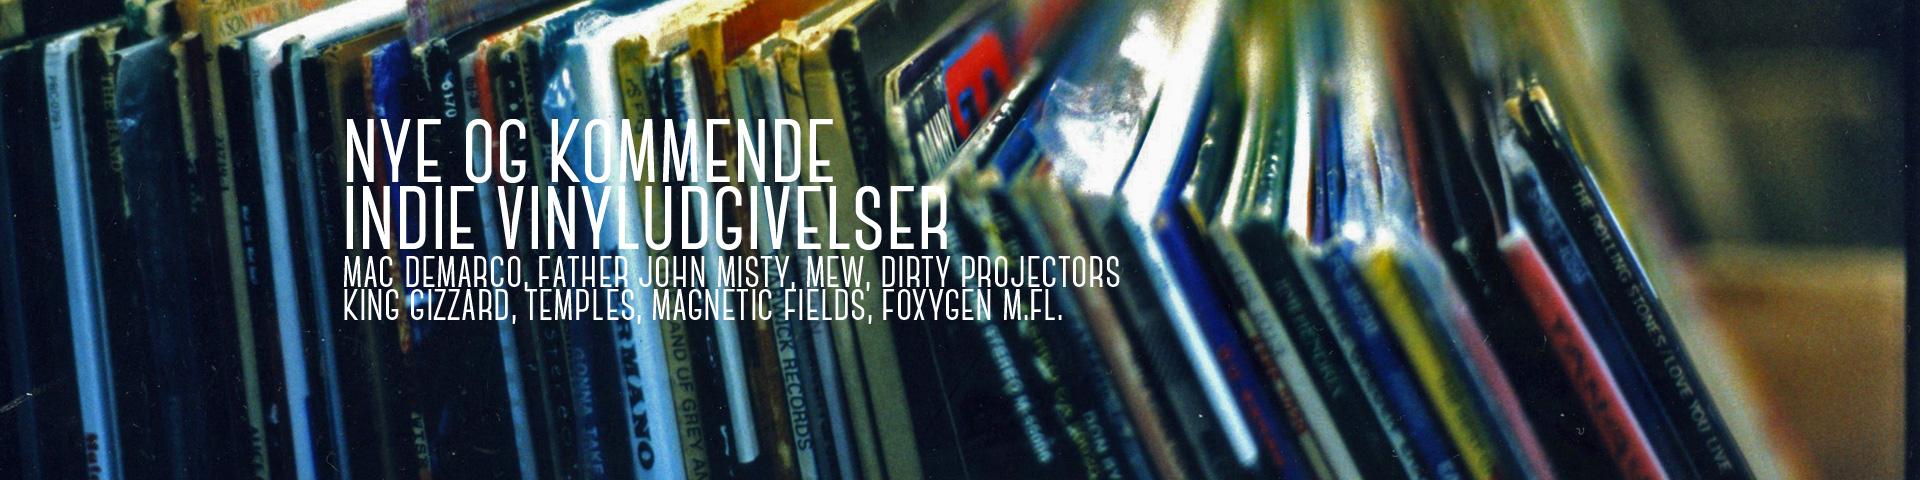 Spændende nye indie vinyler